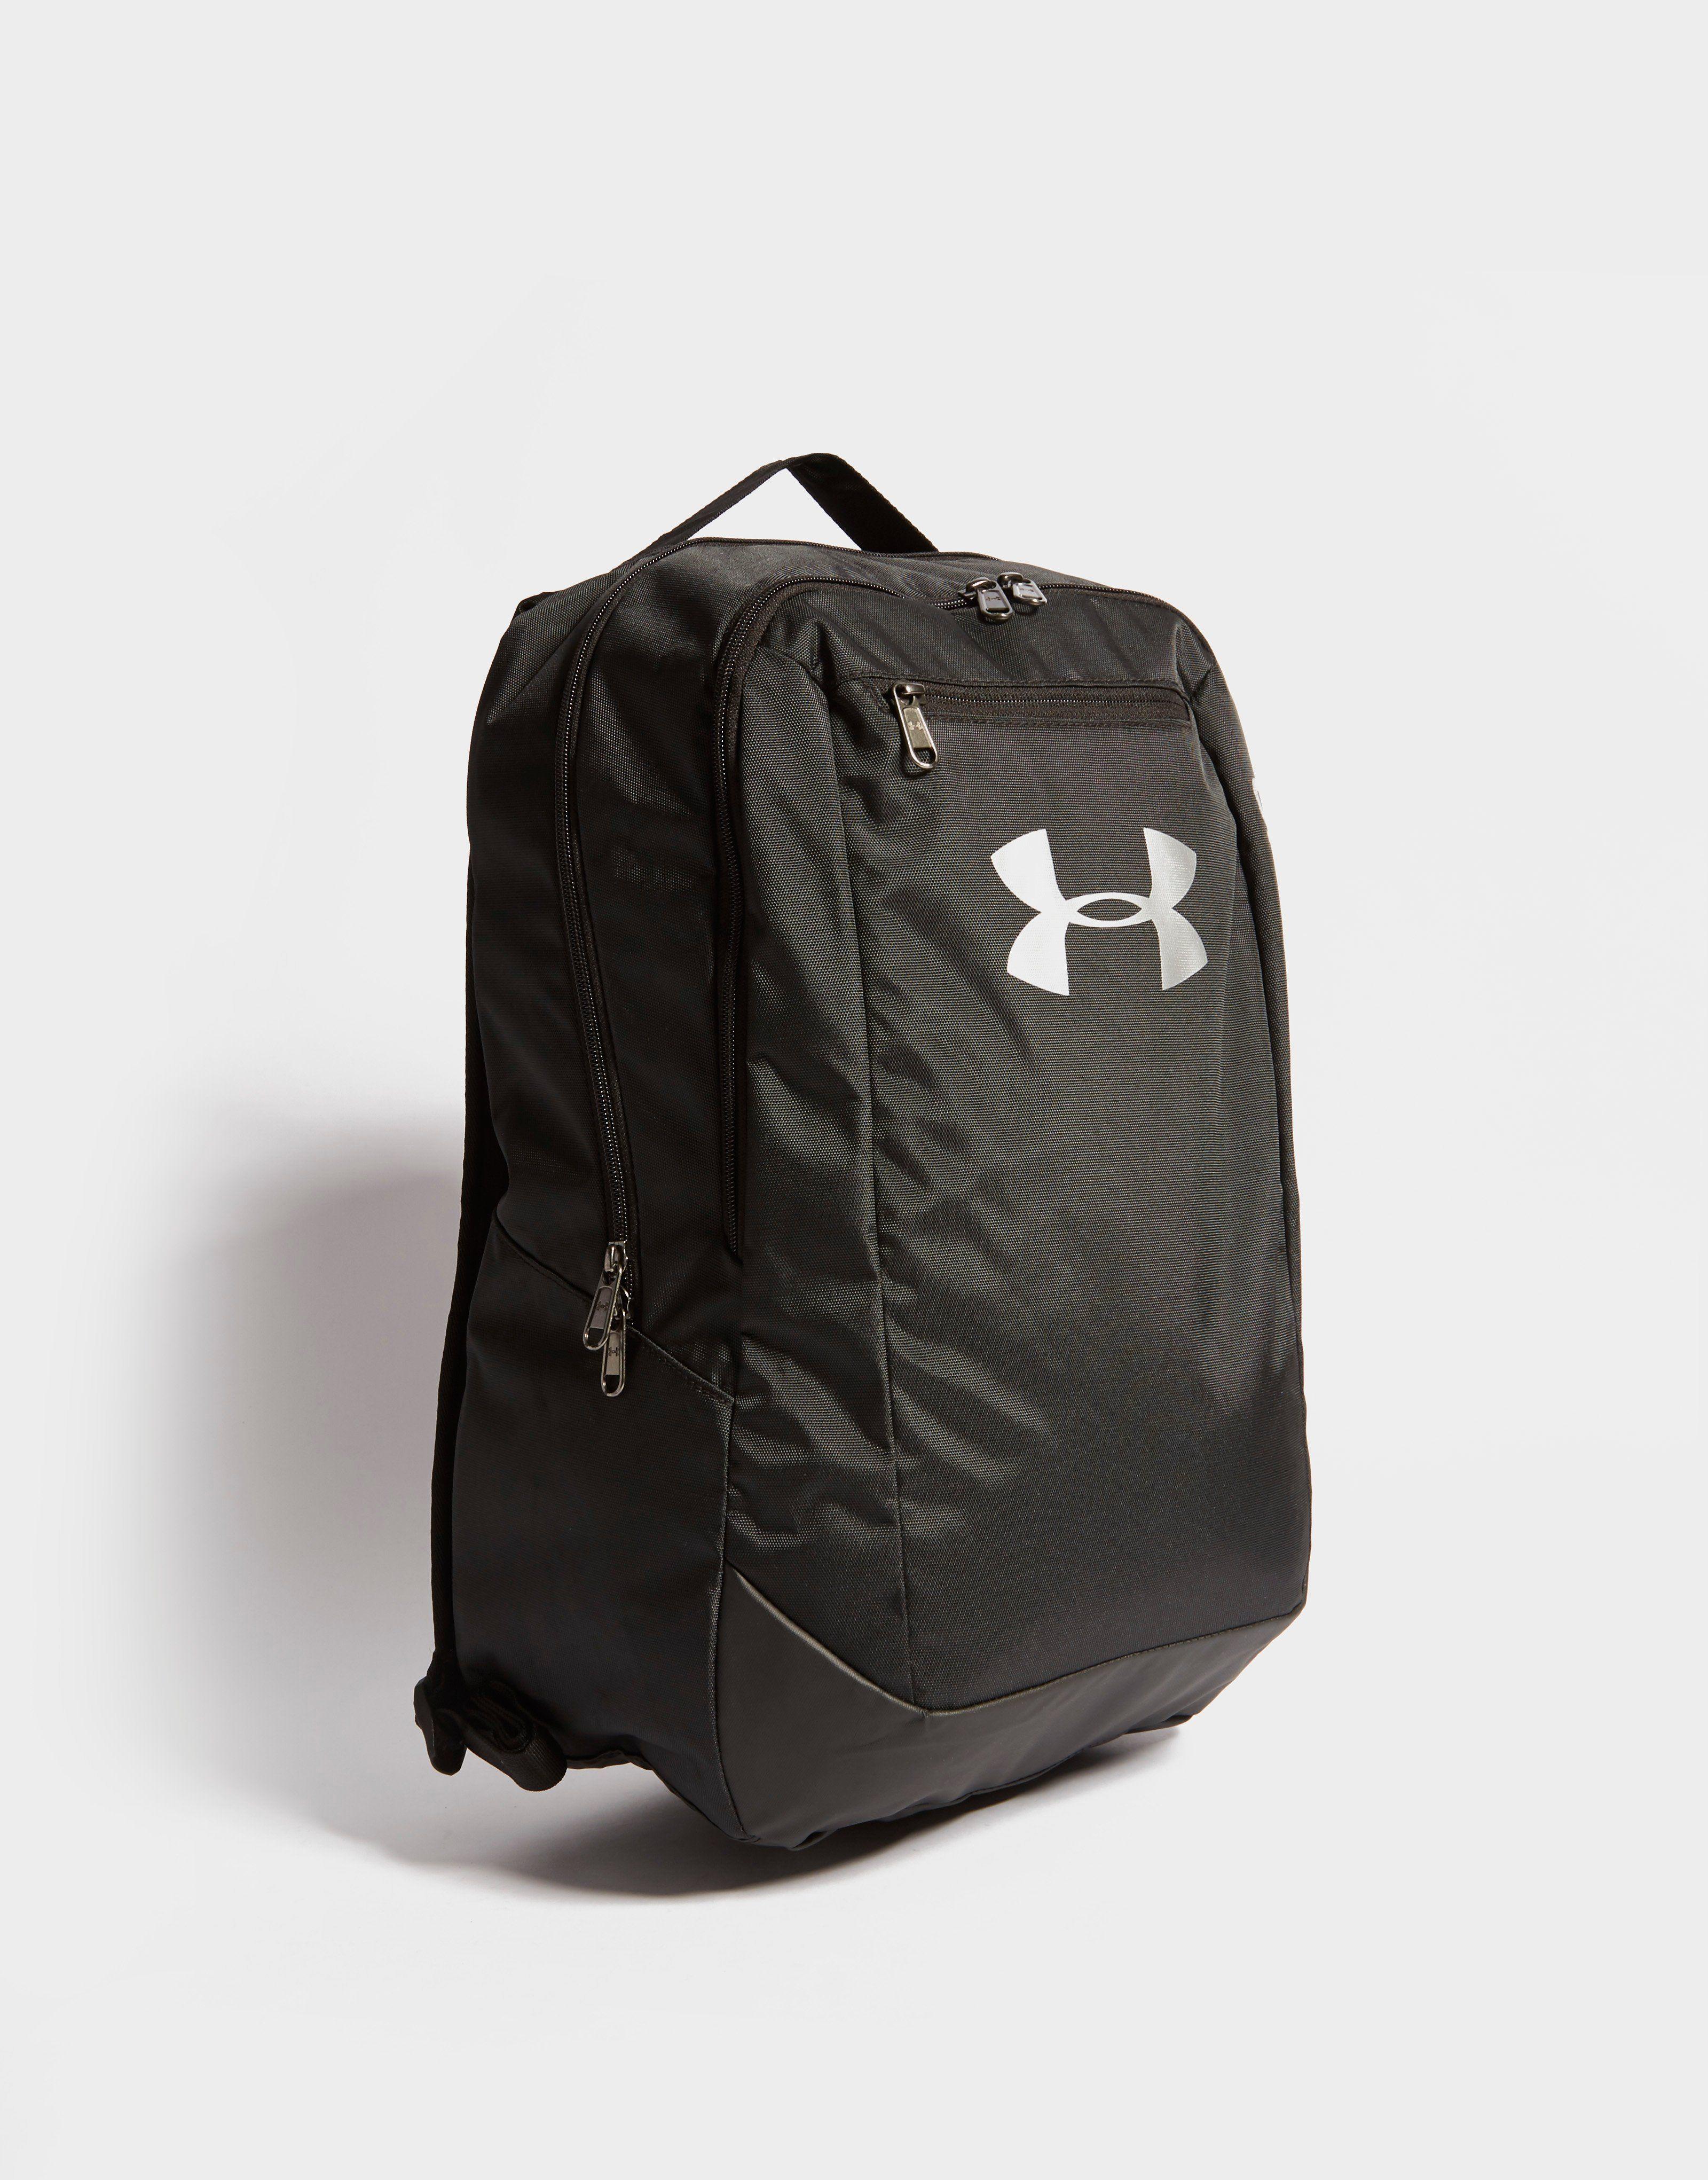 Under Armour Storm Hustle Backpack